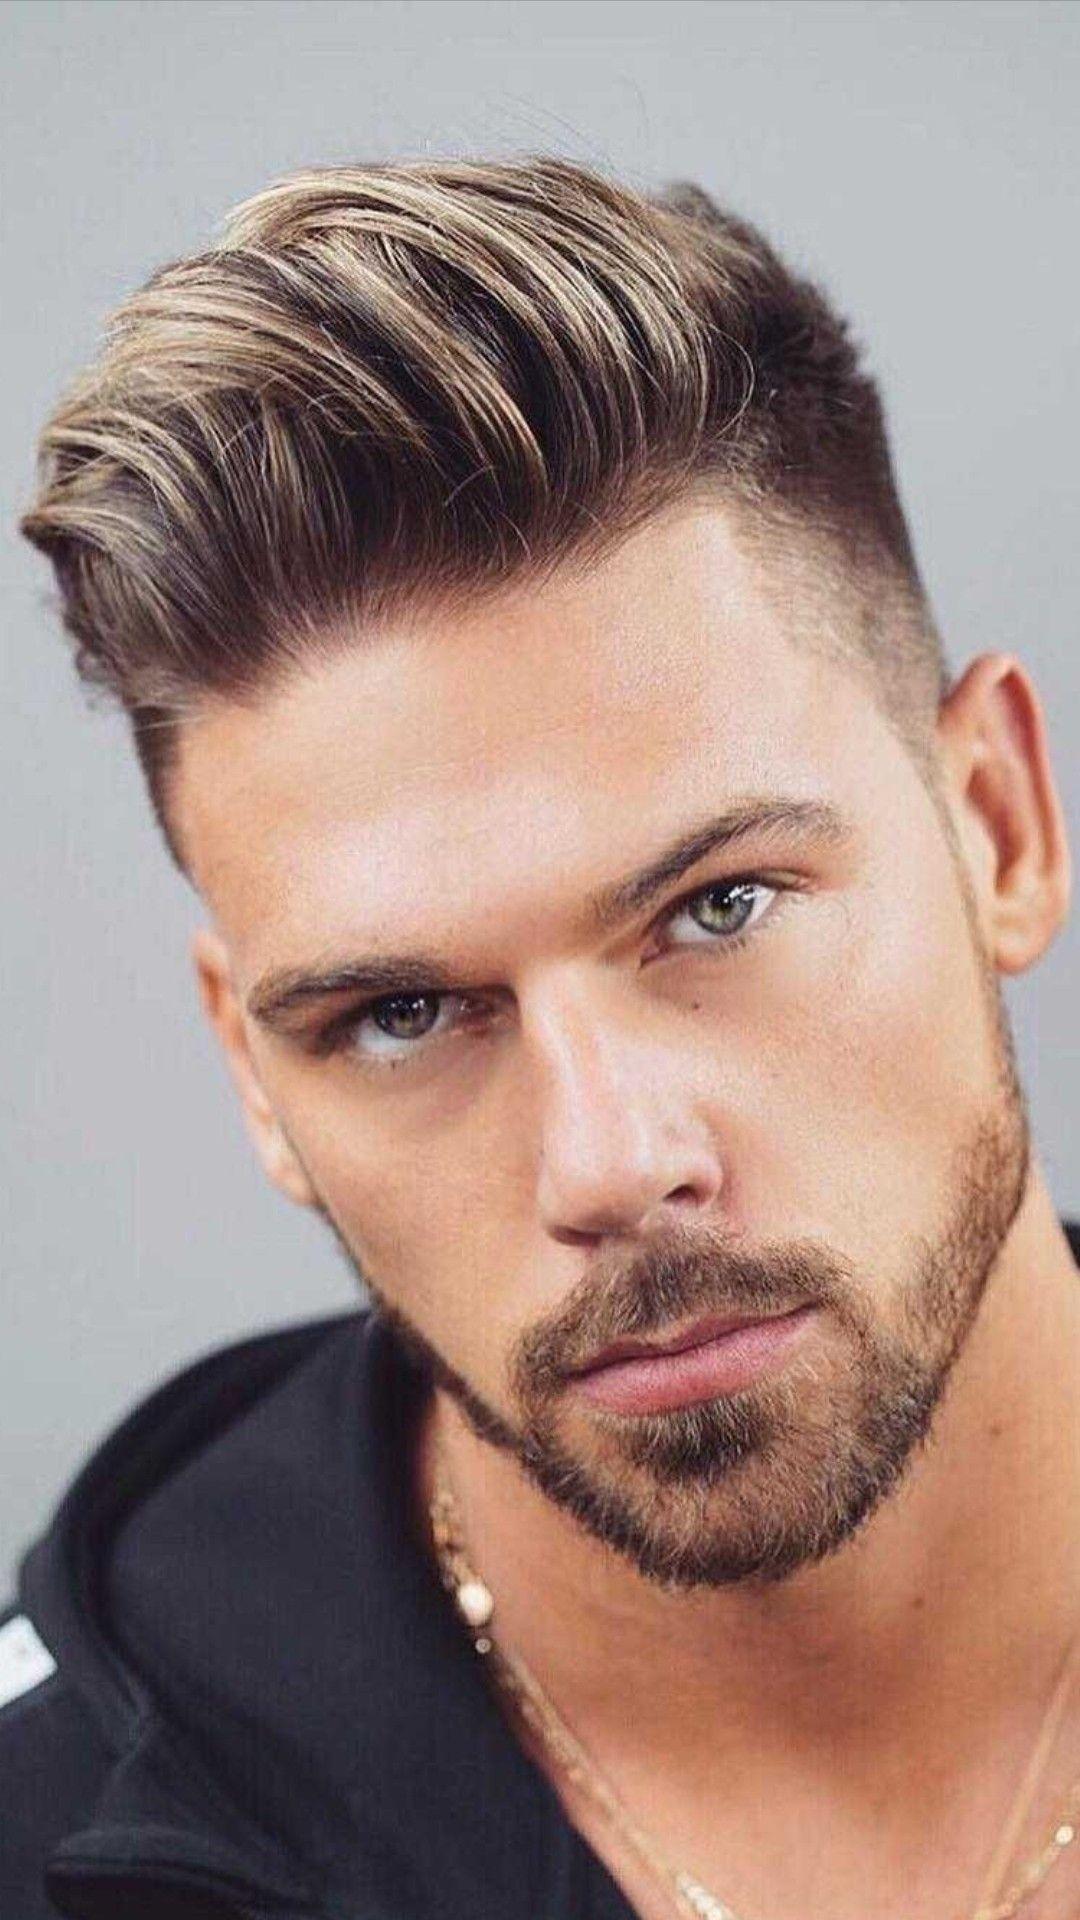 125 Best Haircuts For Men In 2020 Ultimate Guide: Pin En Corte De Cabello